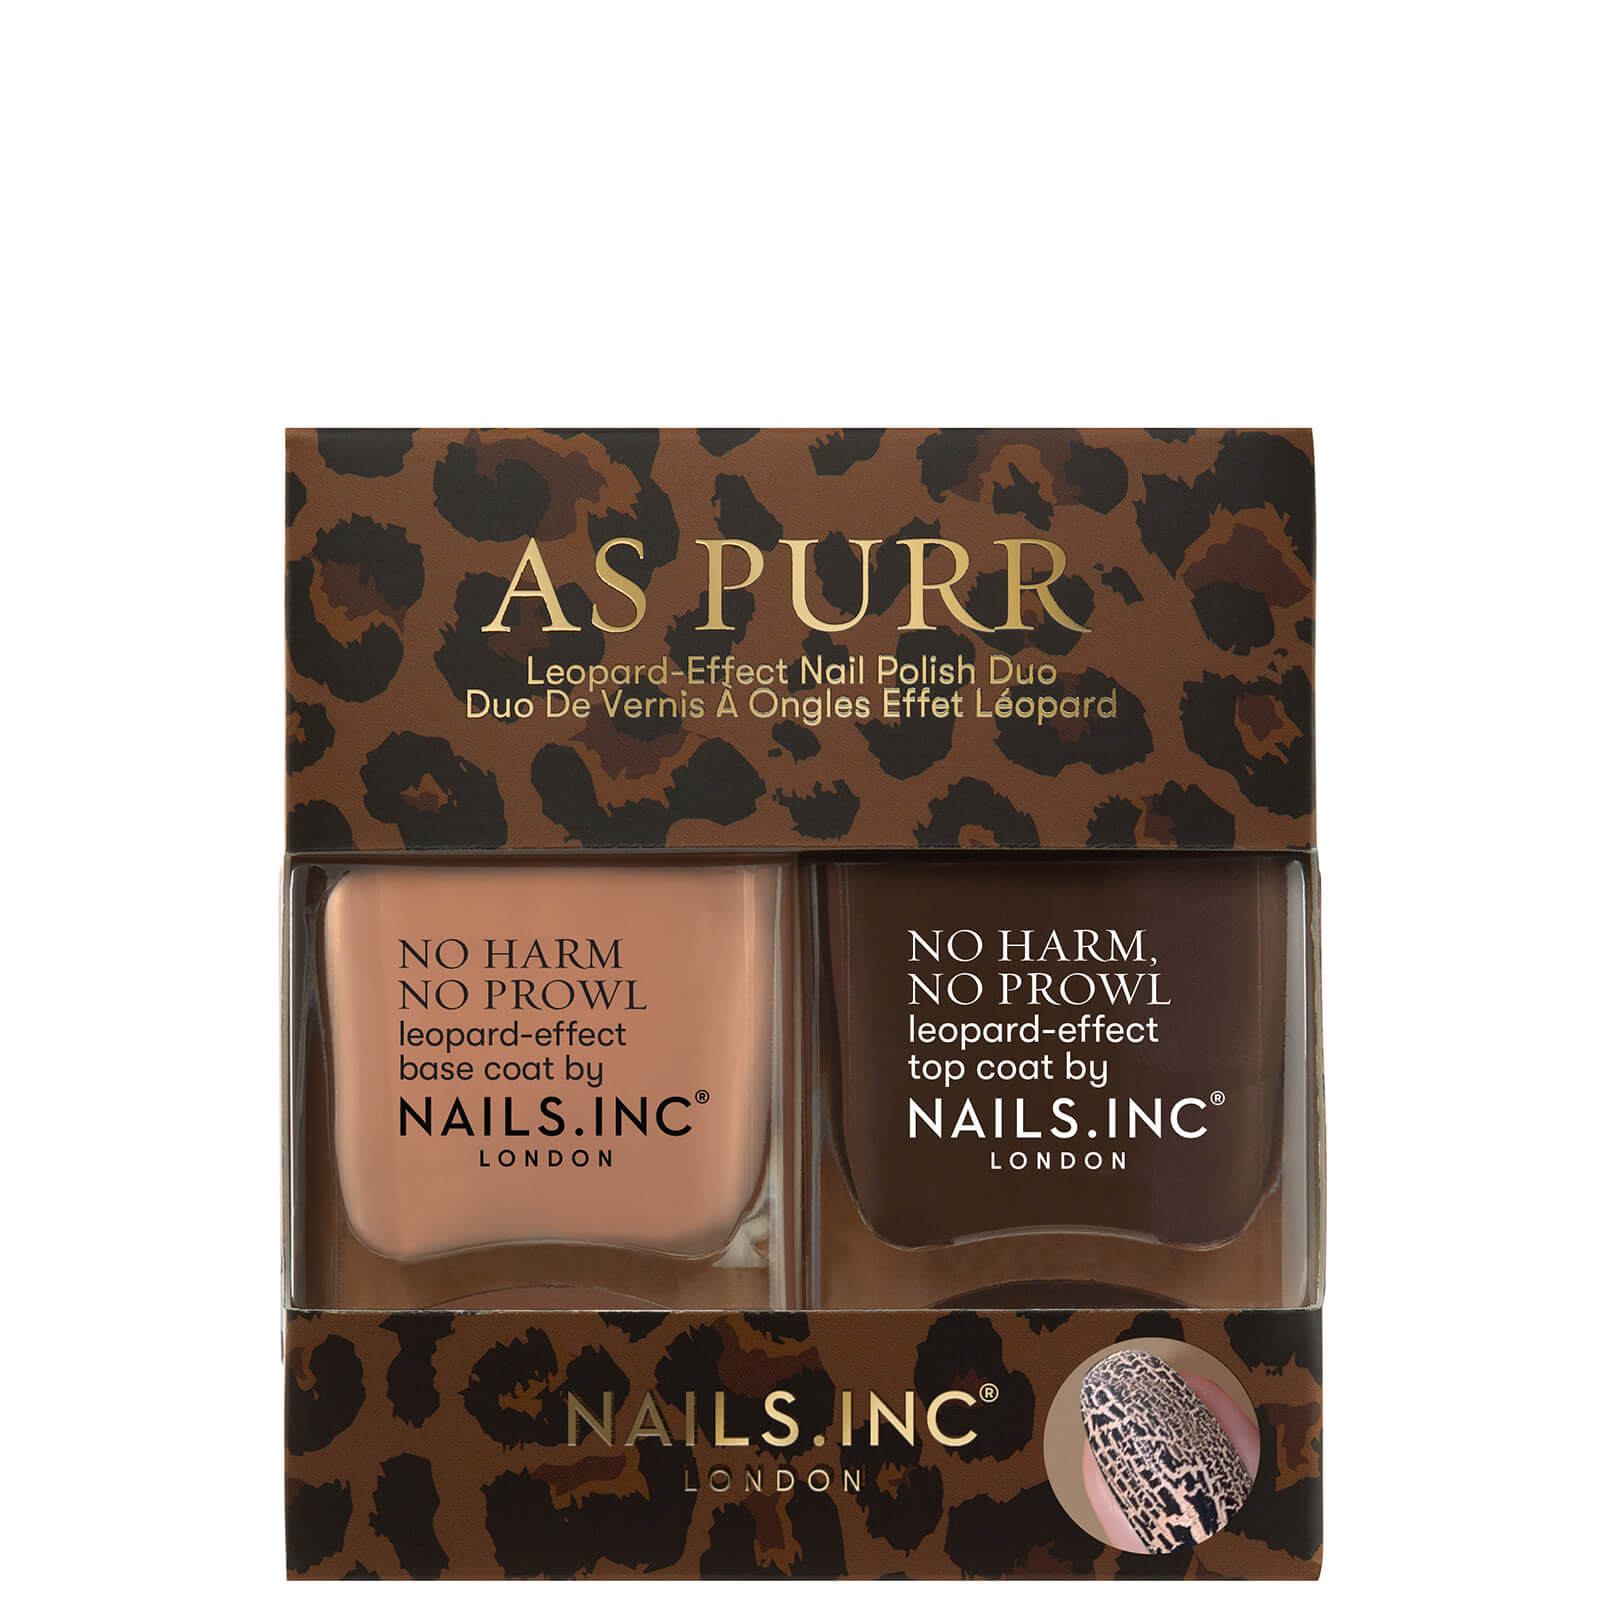 Купить Nails inc. As Purr Leopard Duo